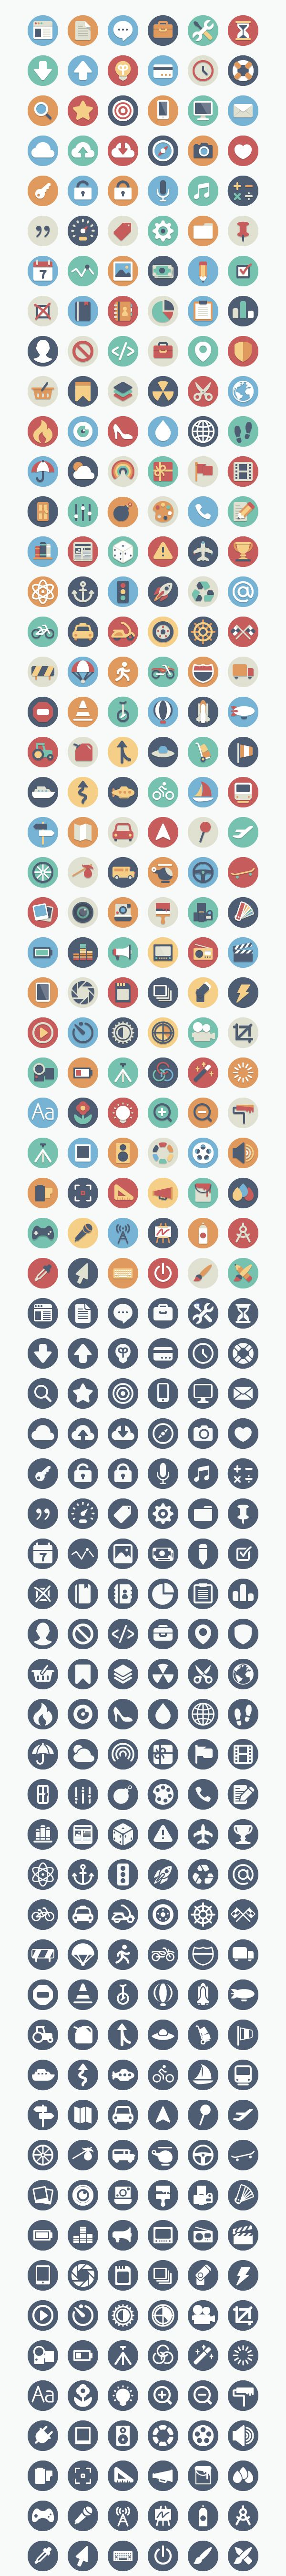 flat icons1 384 beautiful flat icons